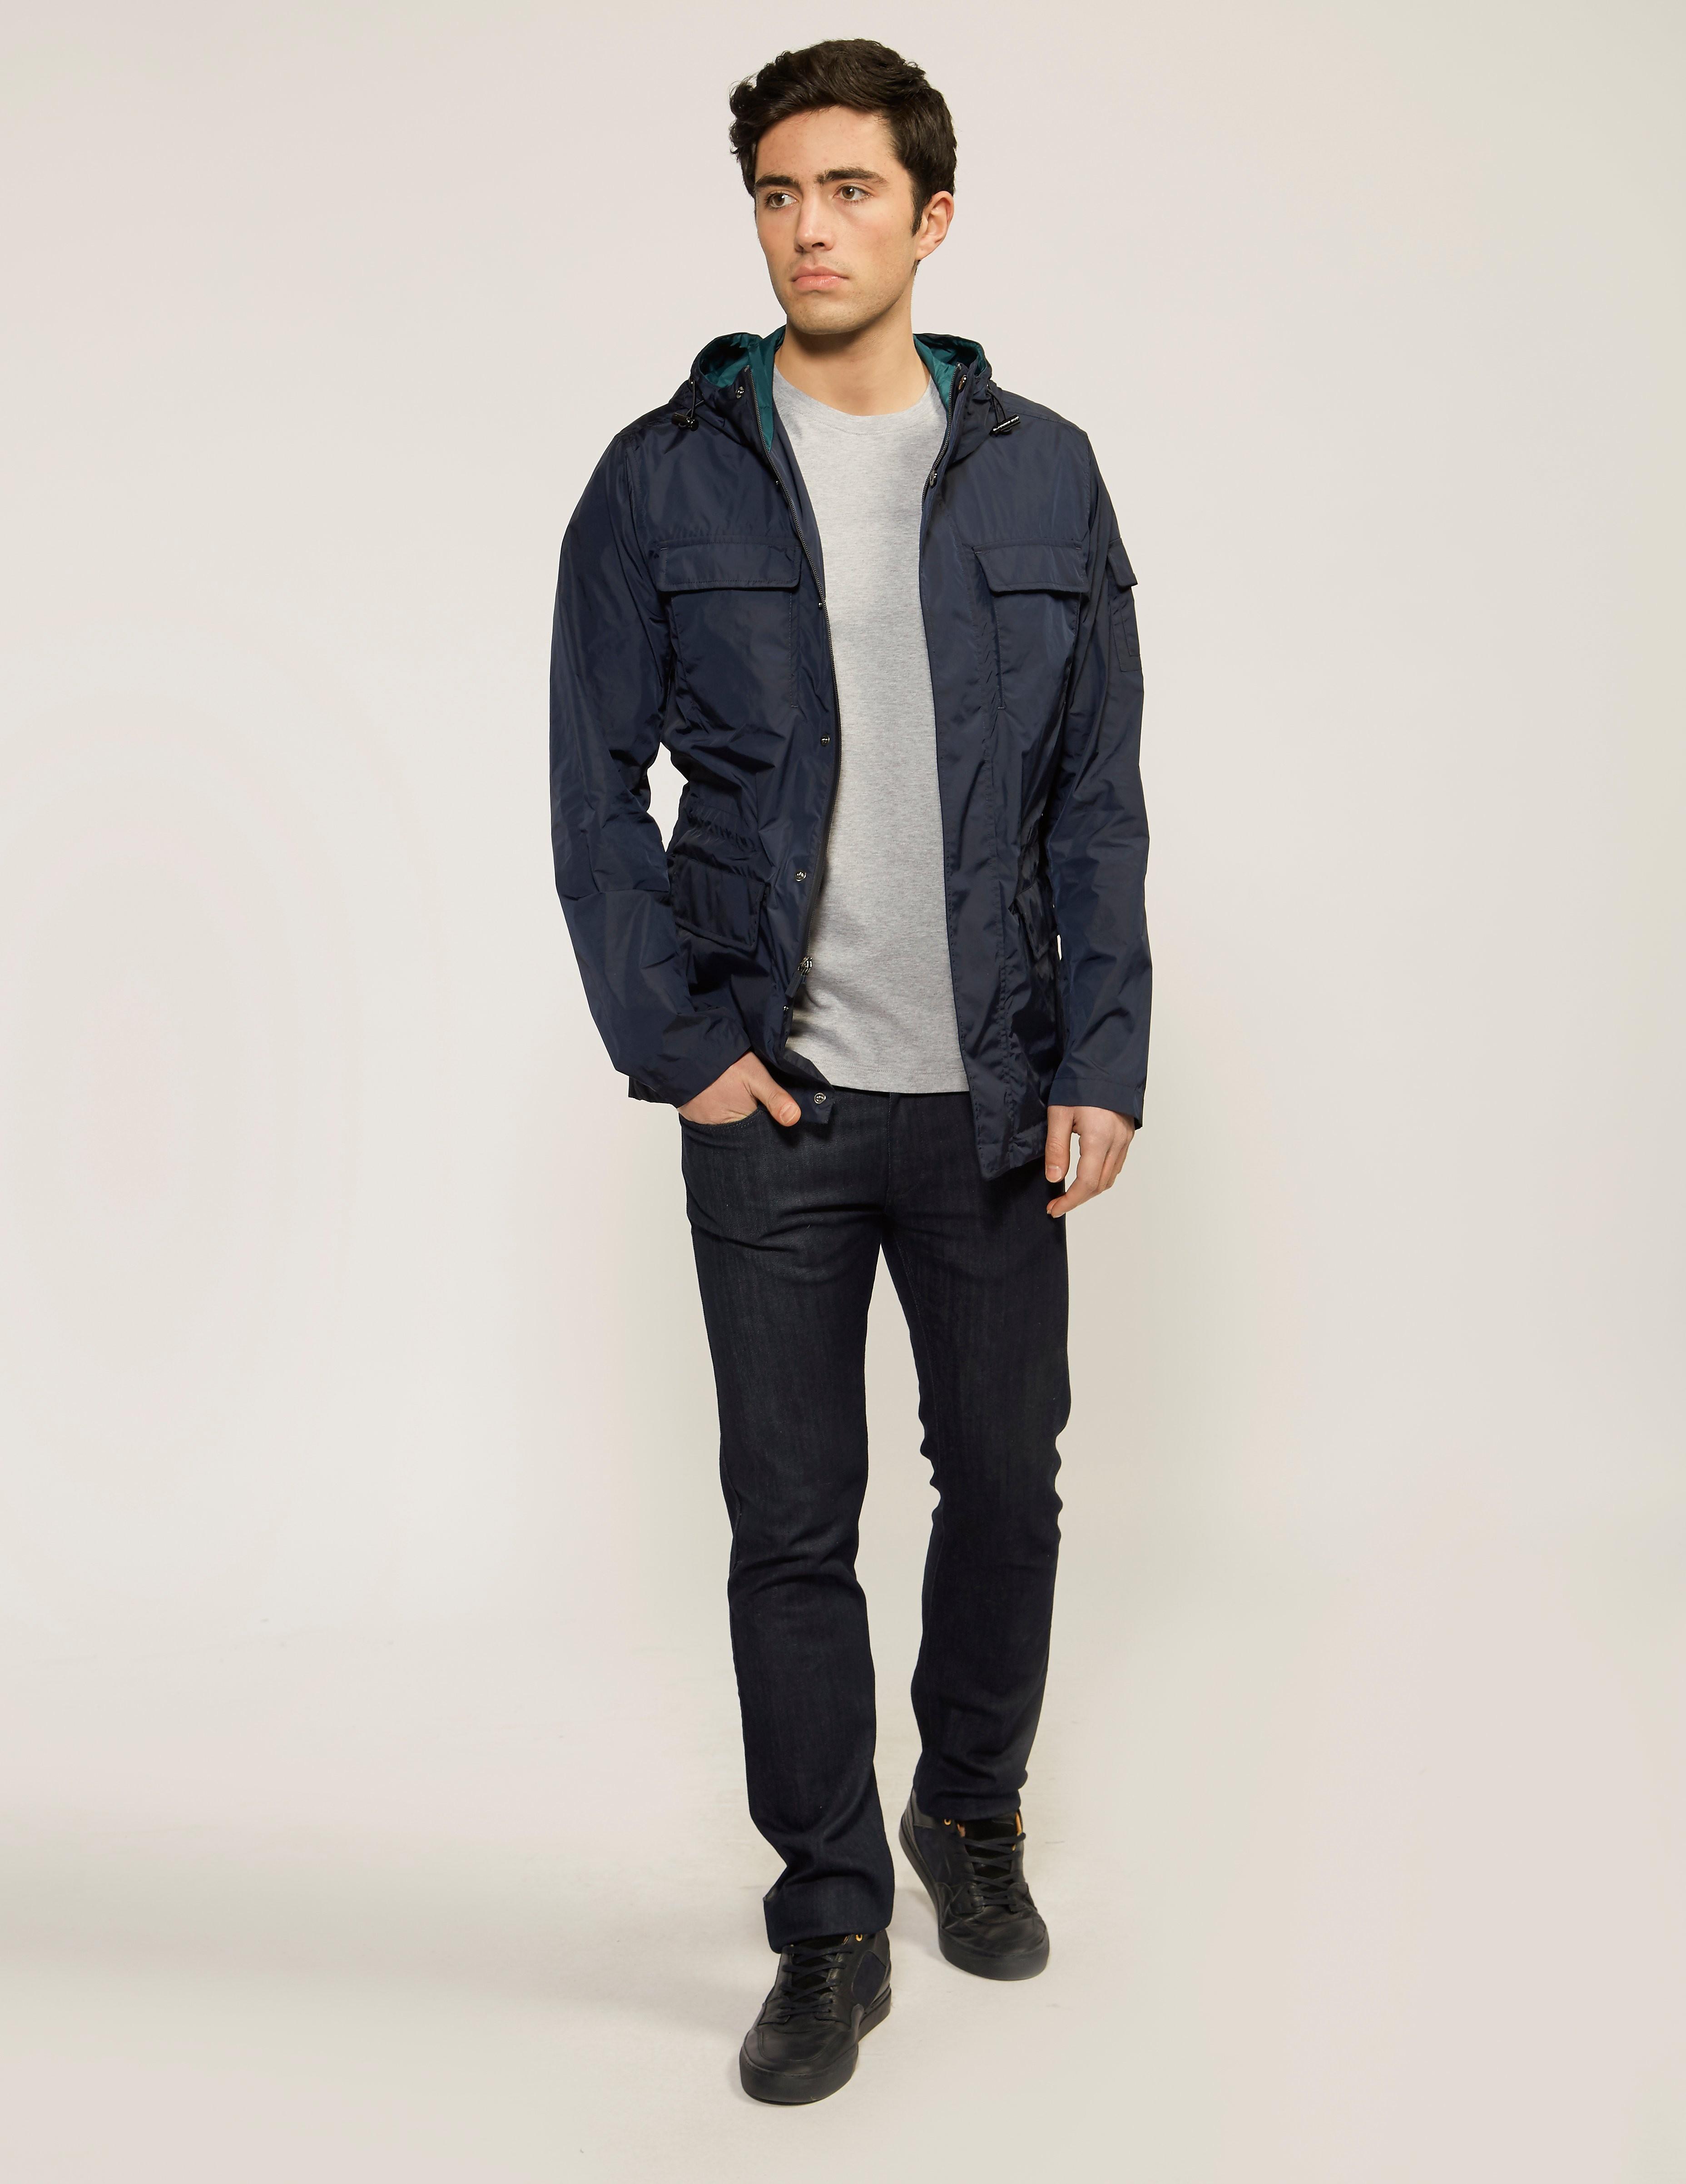 Michael Kors Nylon Jacket